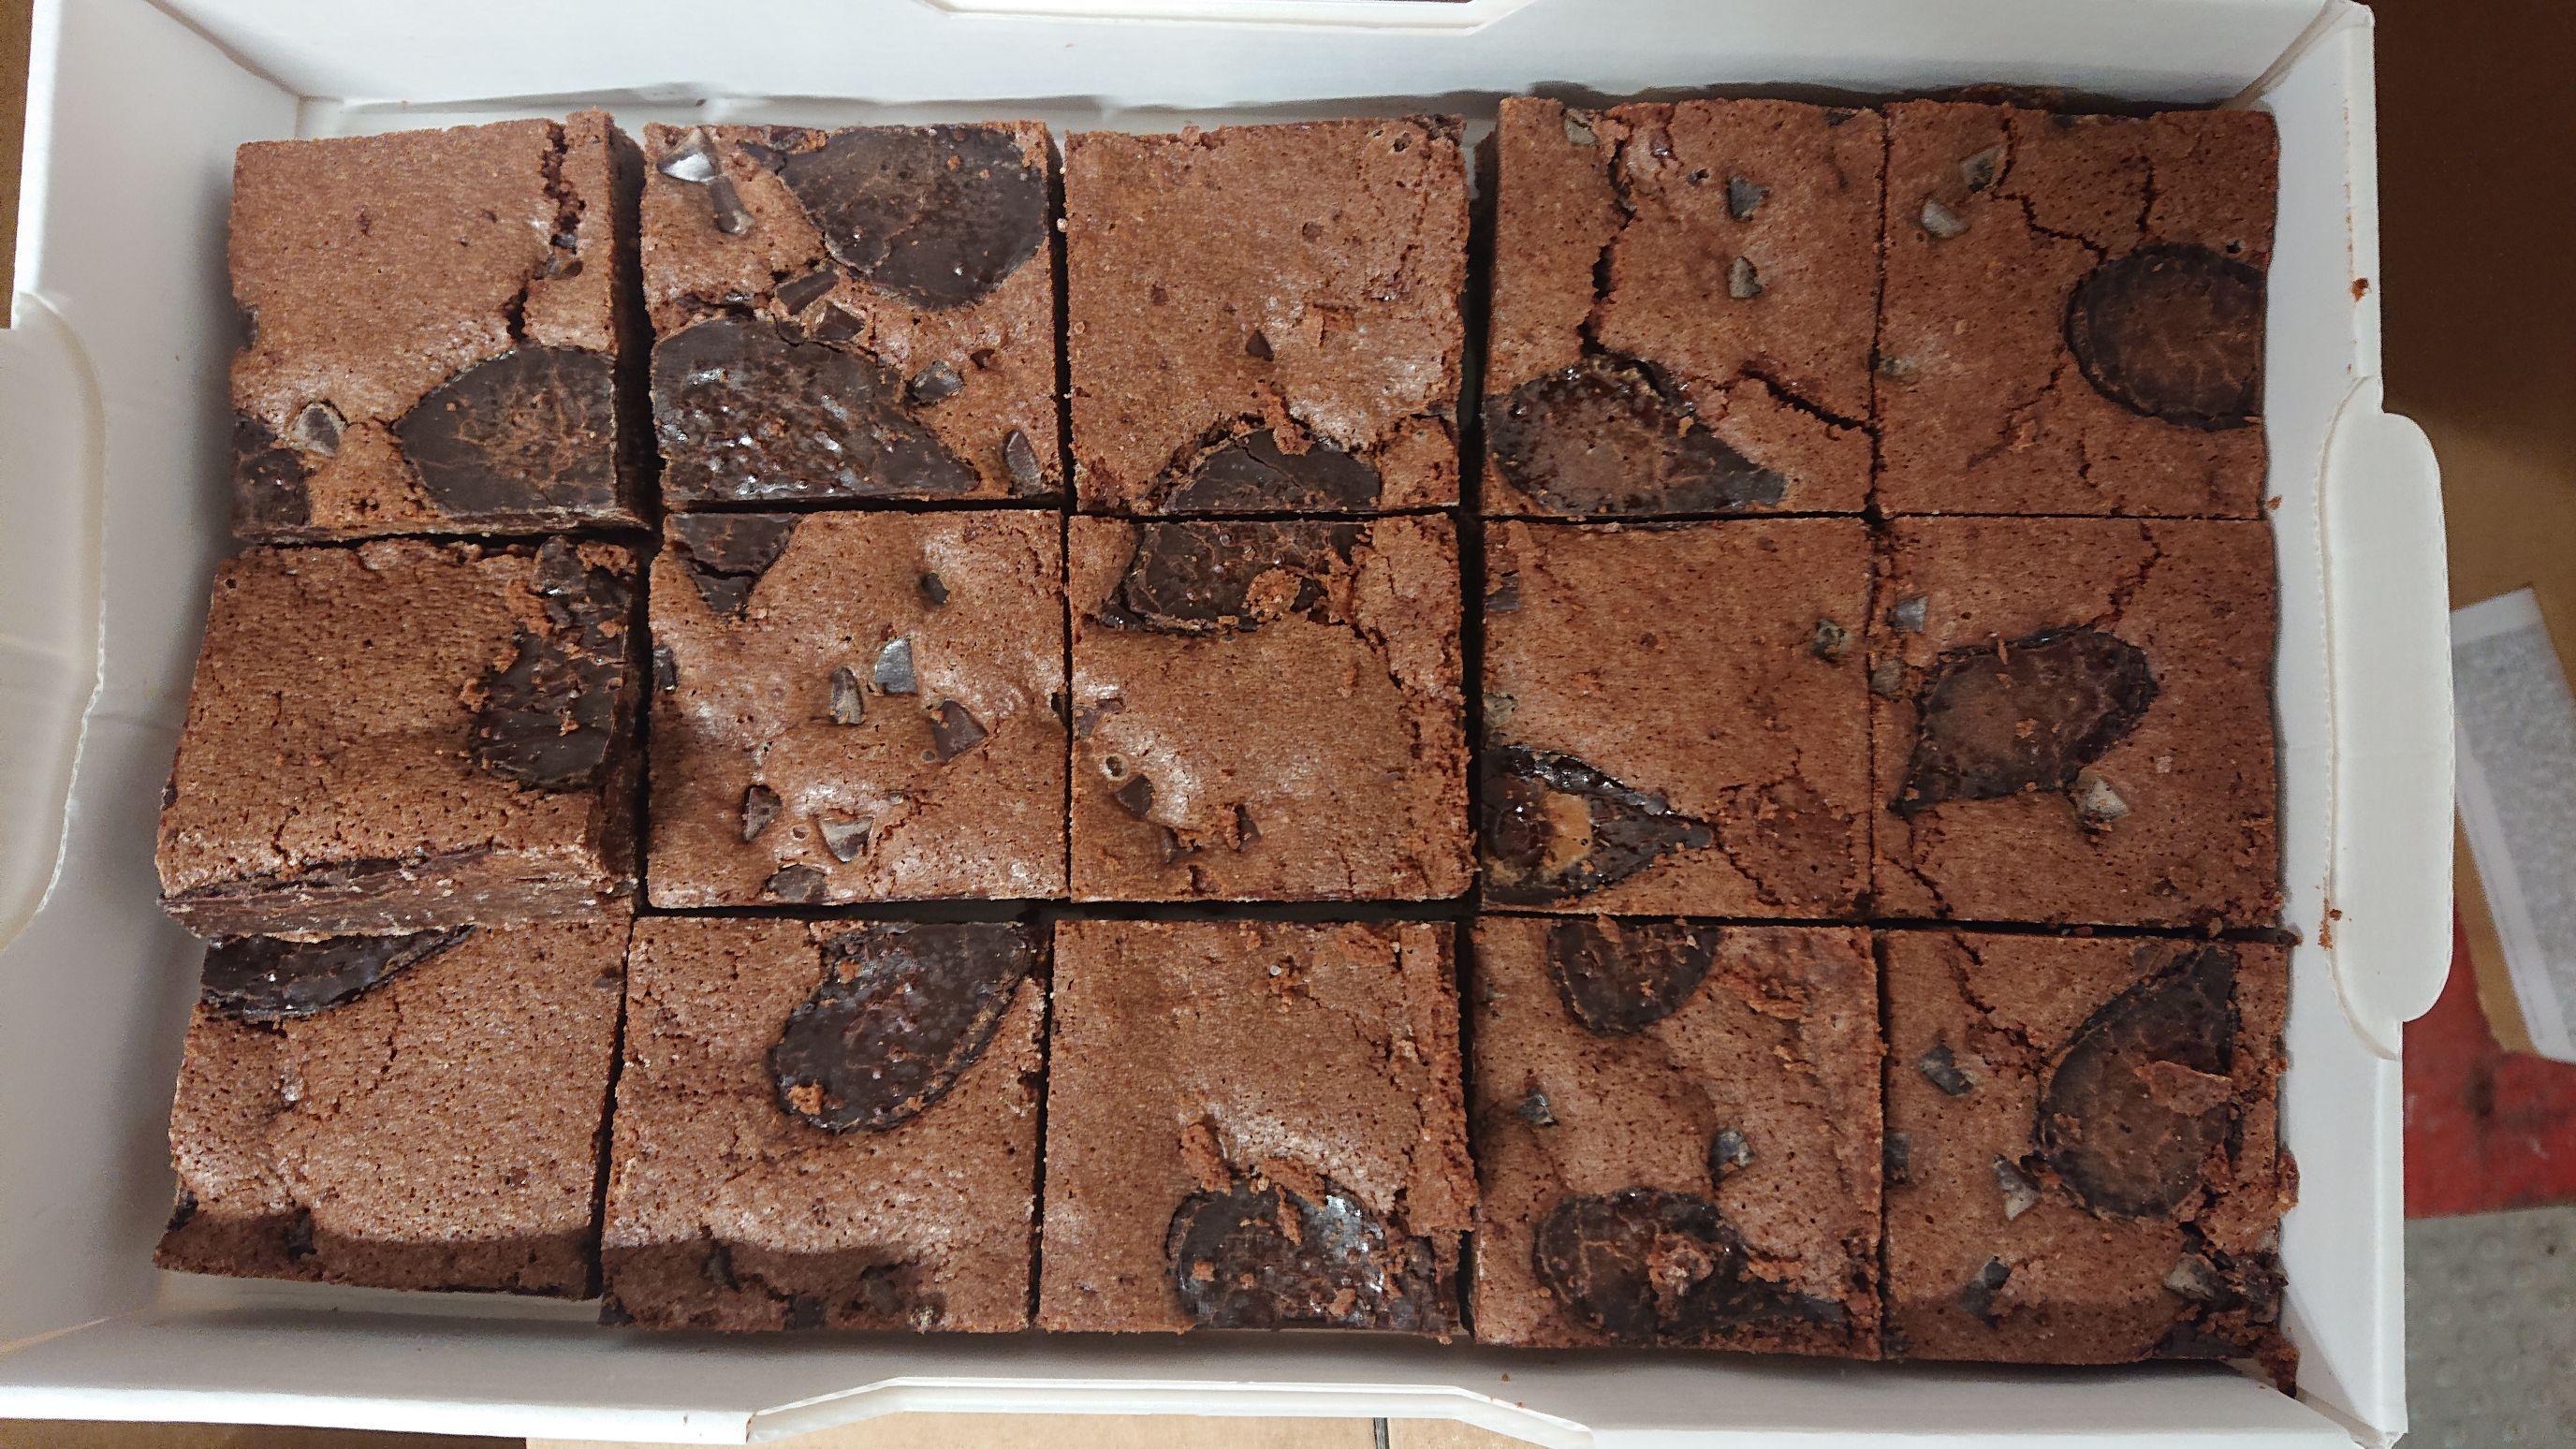 Ultimate Chocolate Brownies 59p at Lidl Bakery